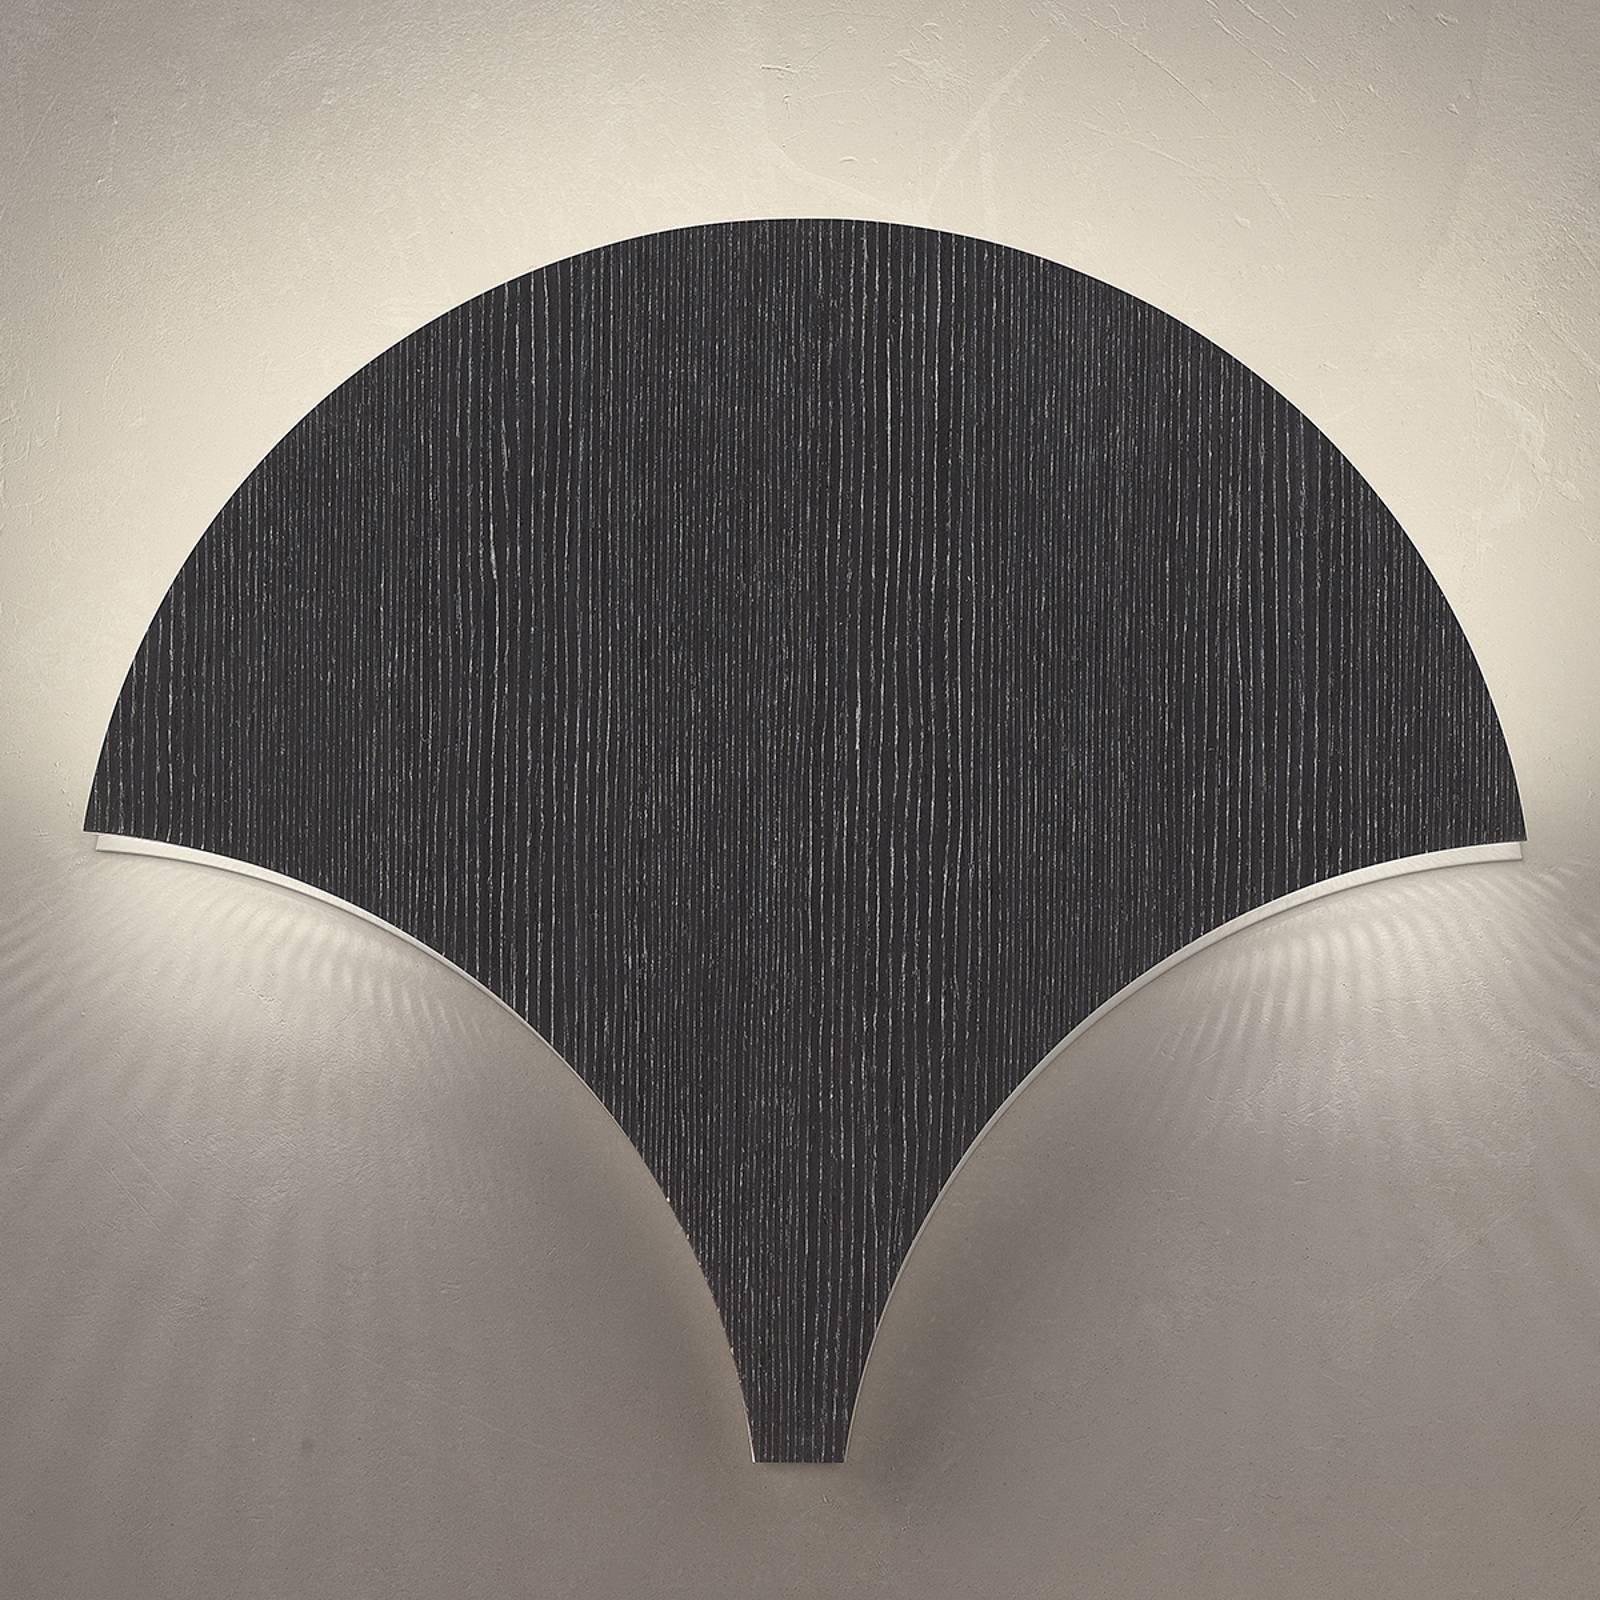 LED-vegglampe Palm, svart-sølv